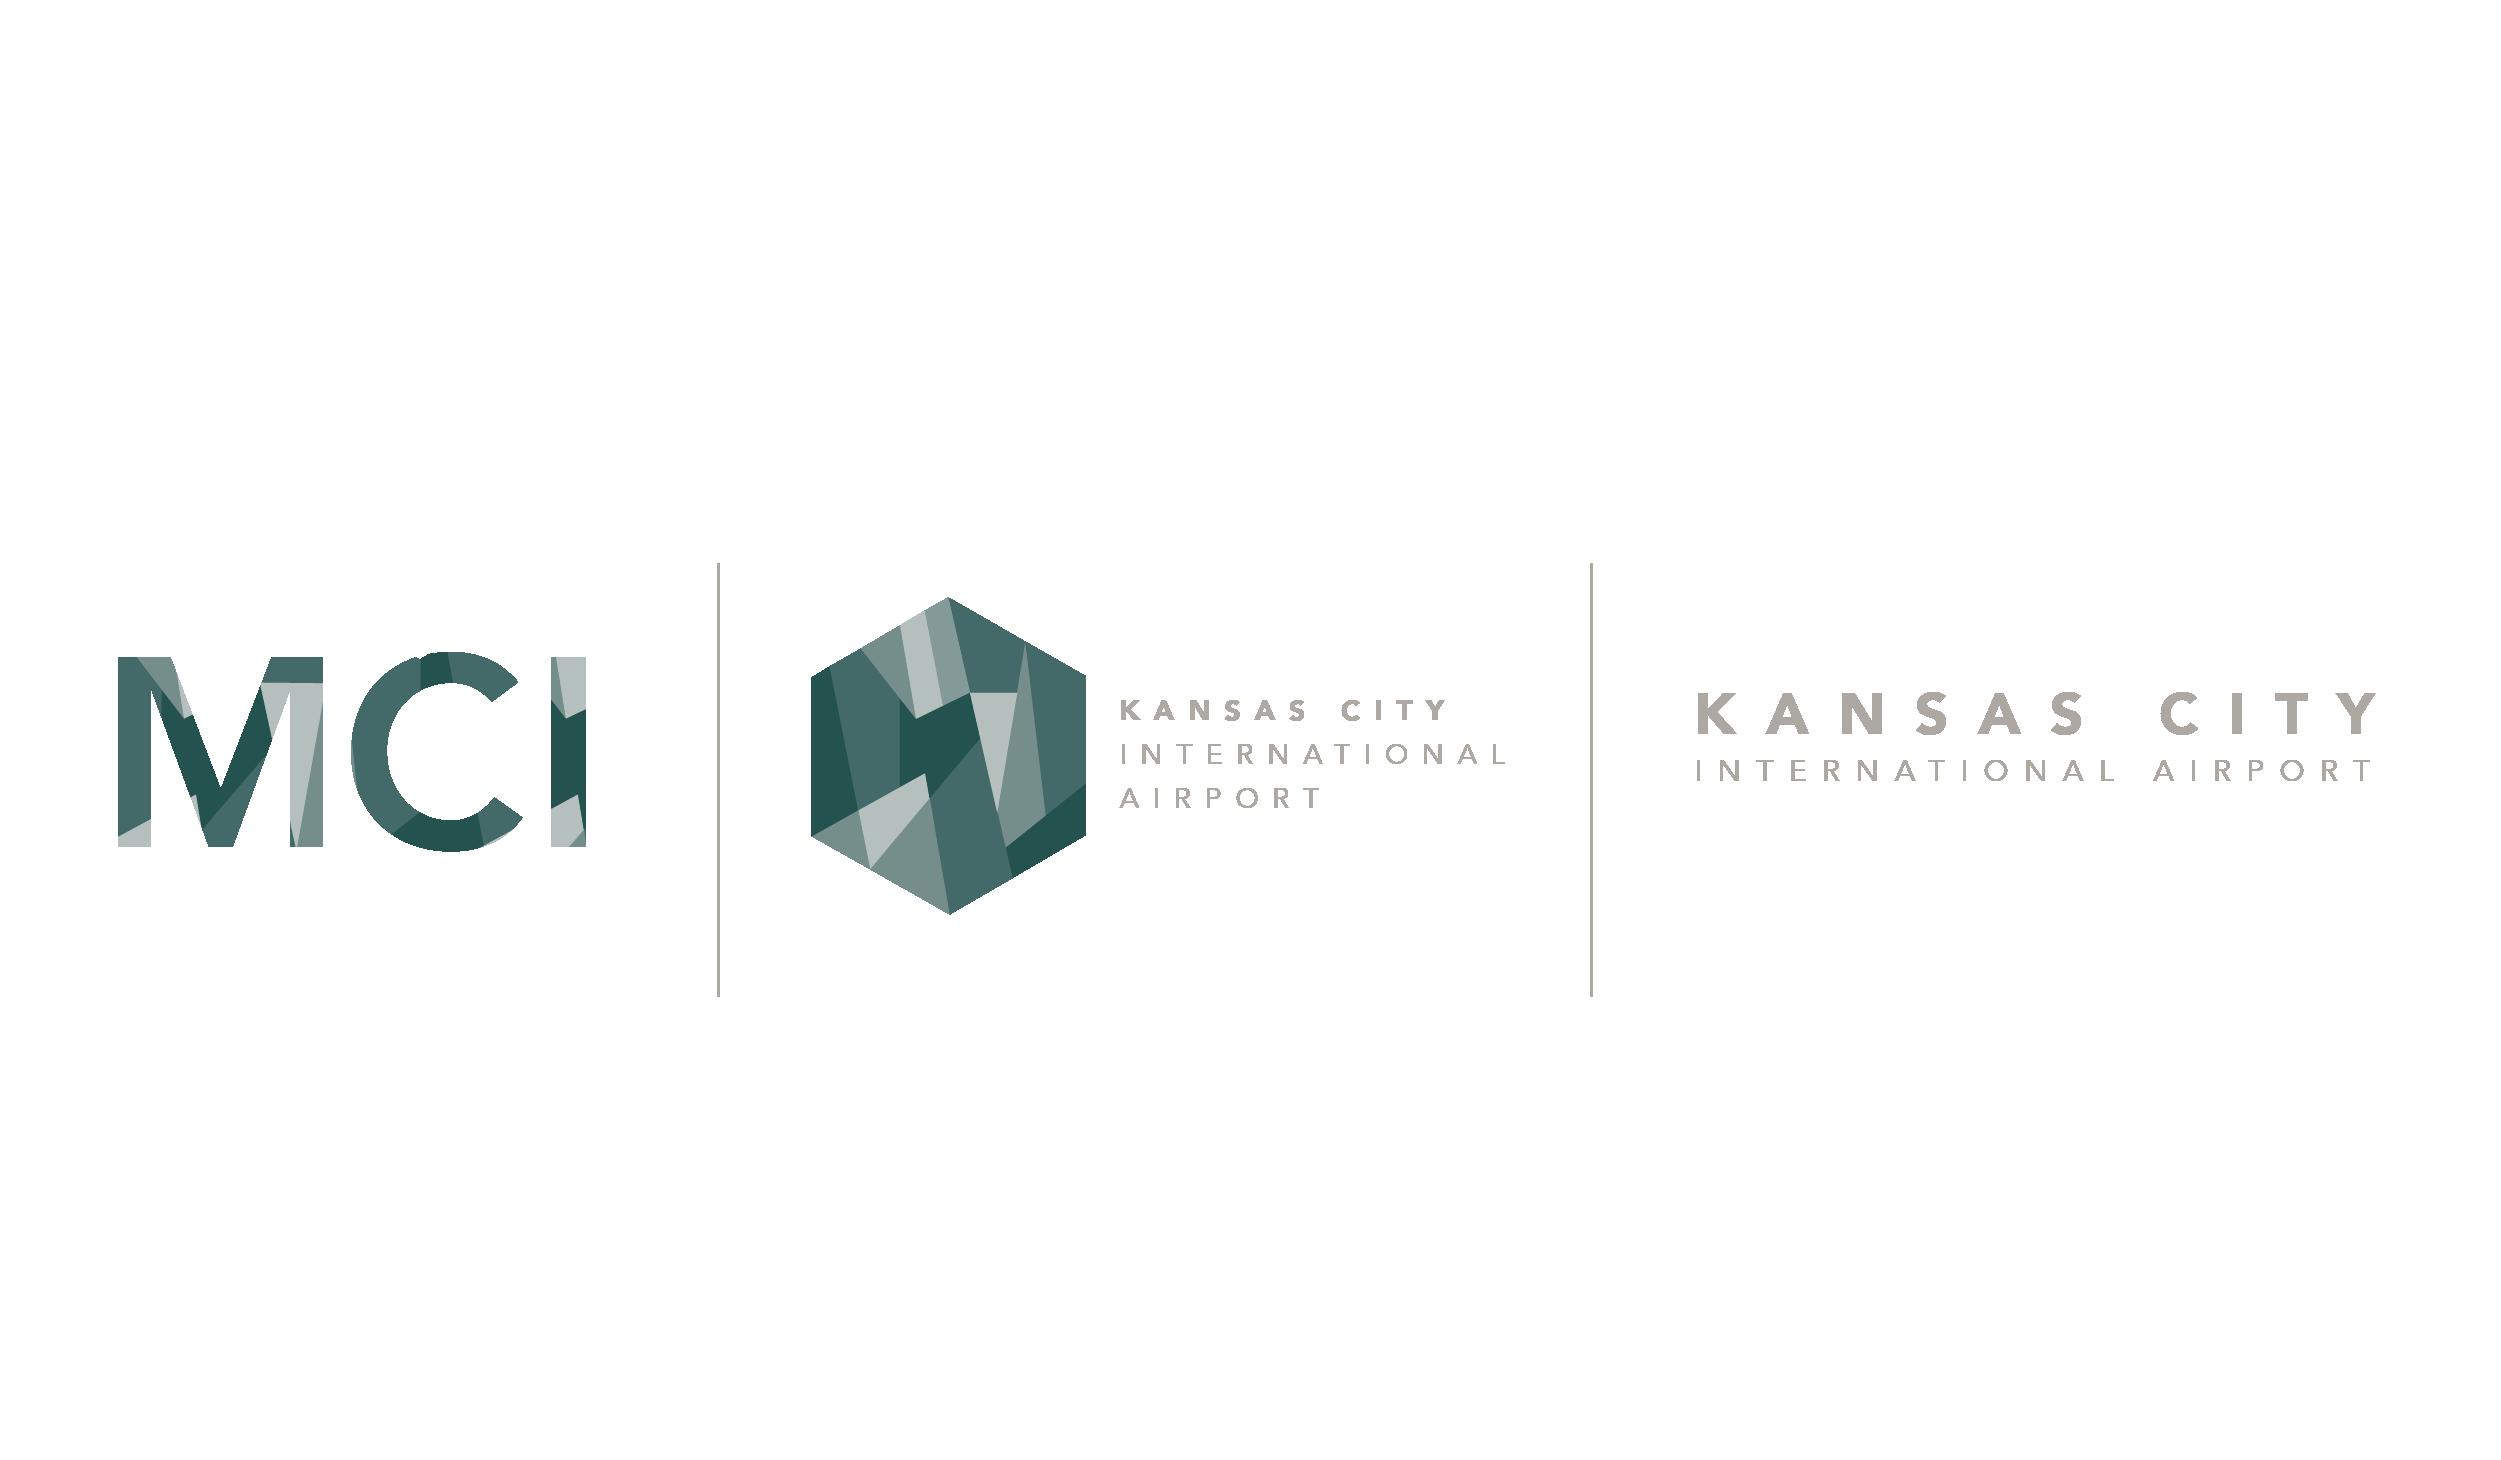 logos by whyldandcostudios international airport